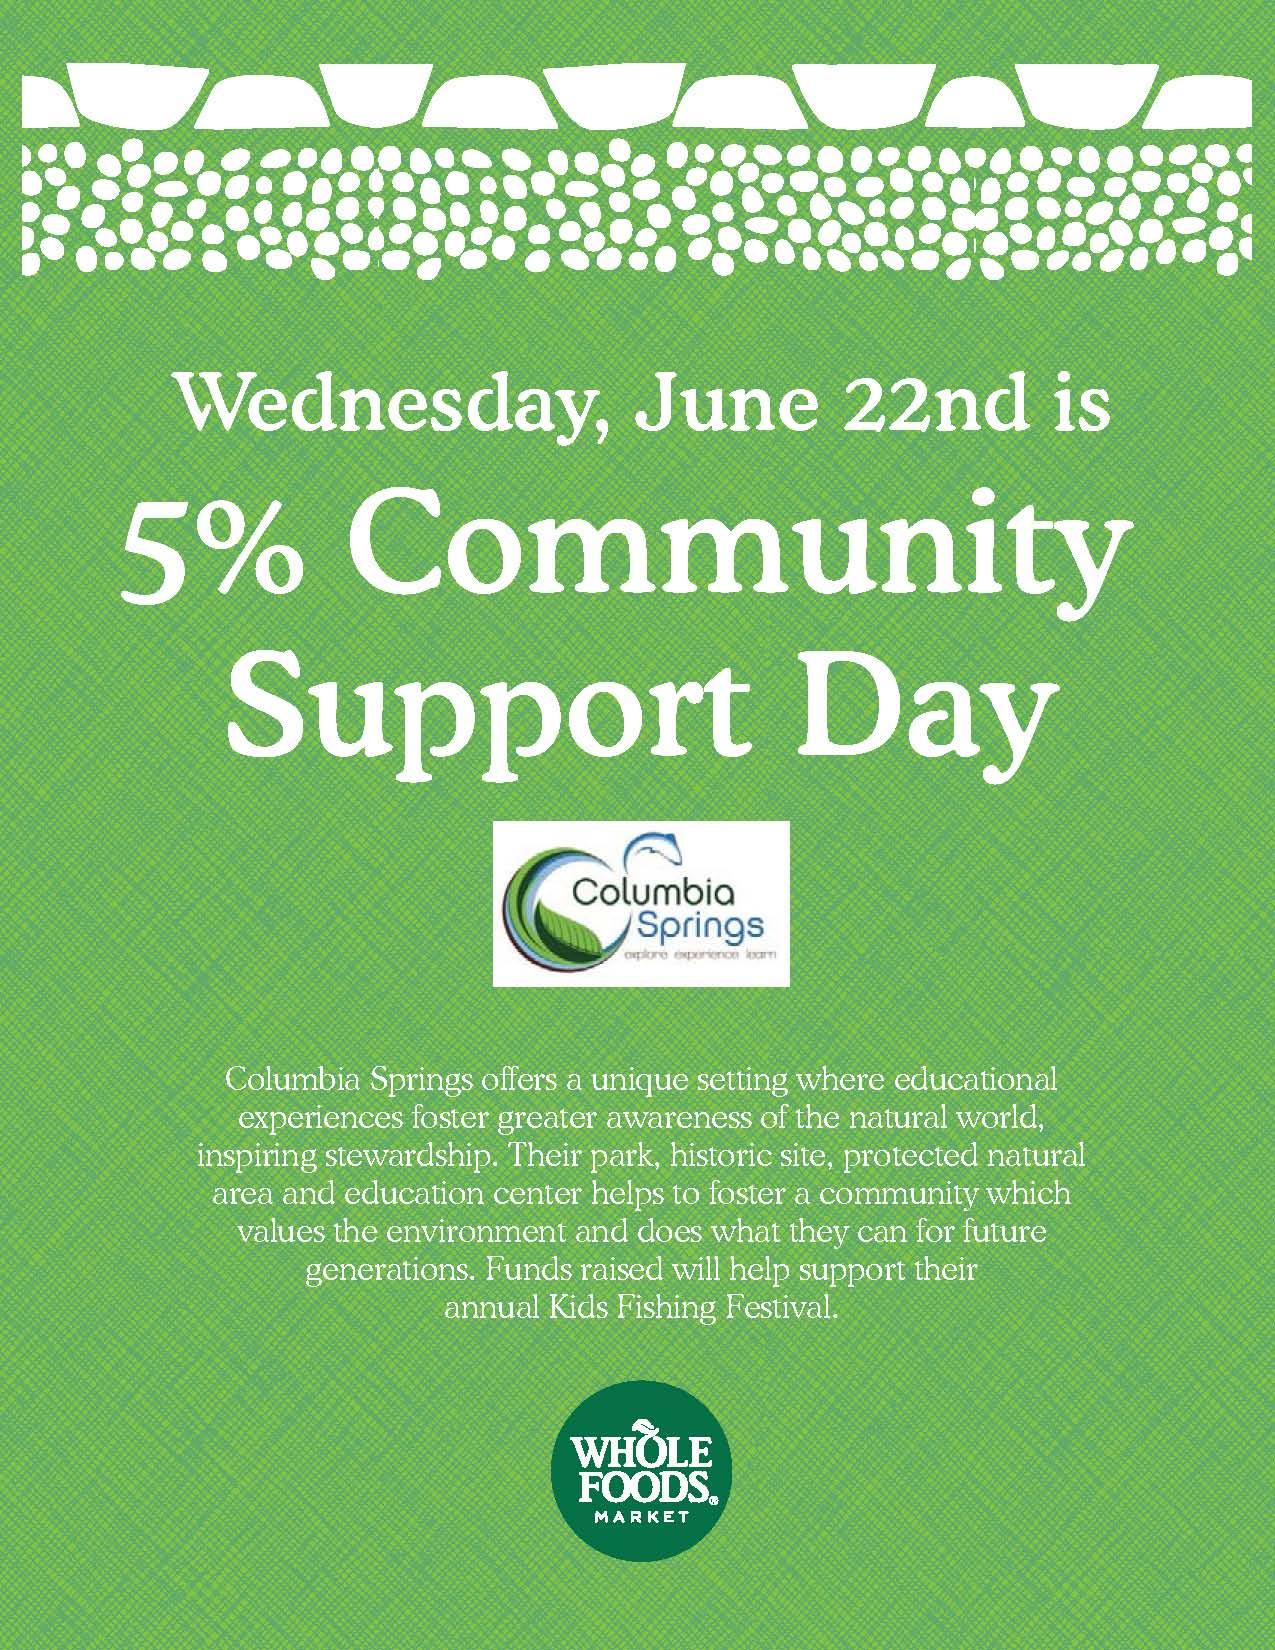 Buy Tasty Food, Support Columbia Springs!